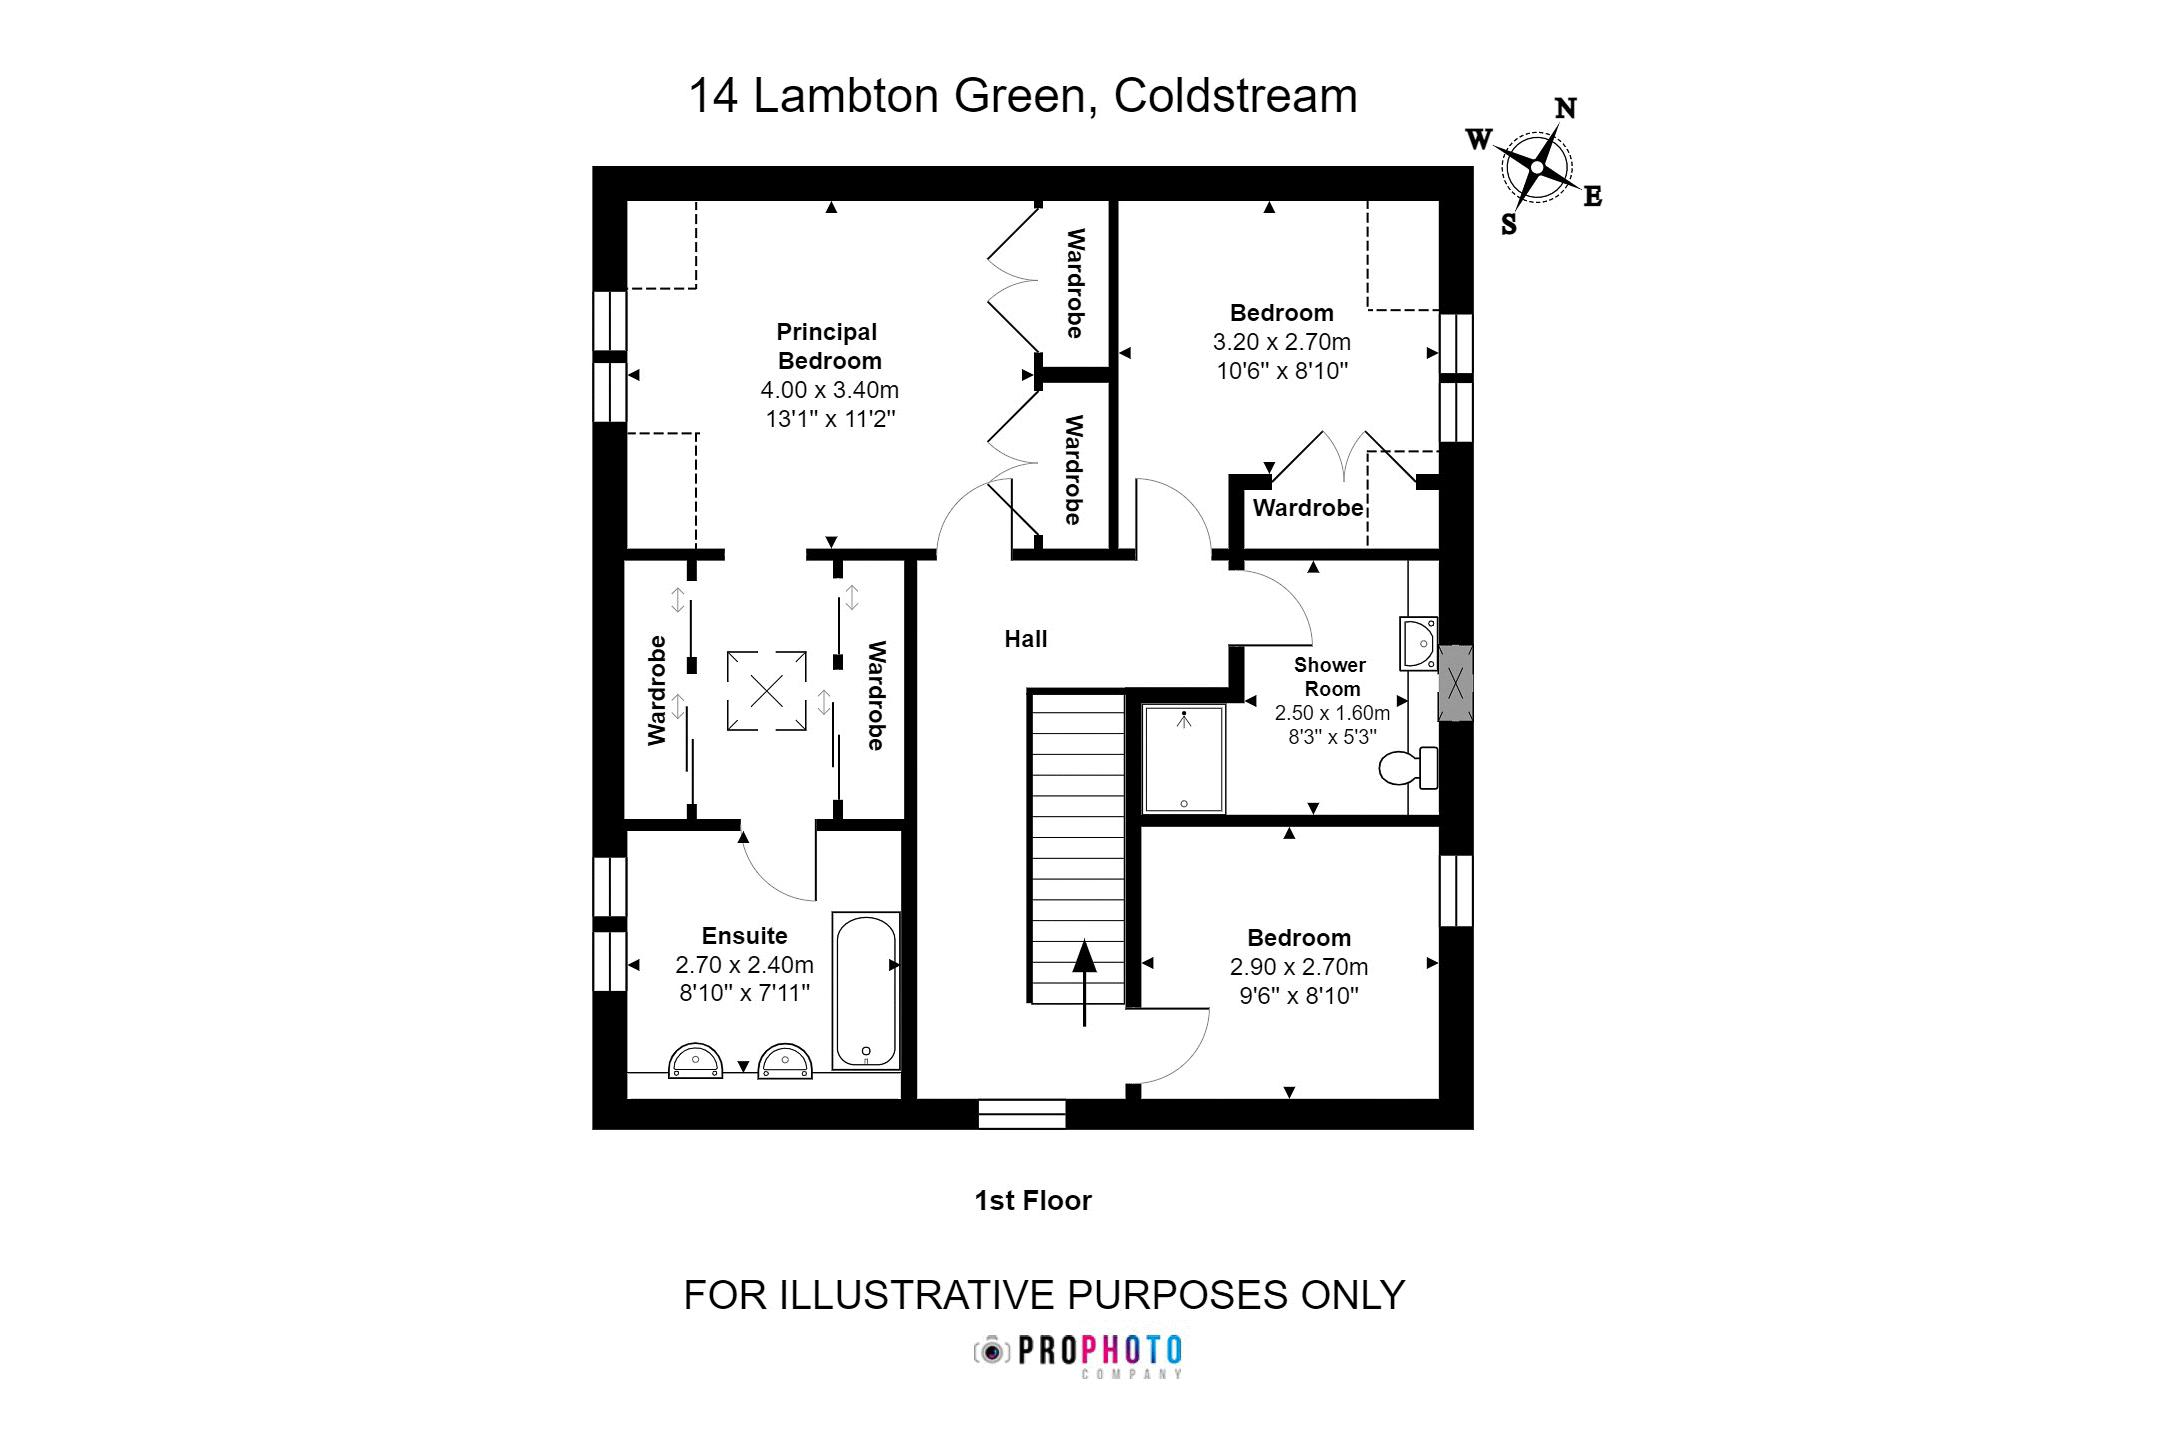 14 Lambton Green First Floor